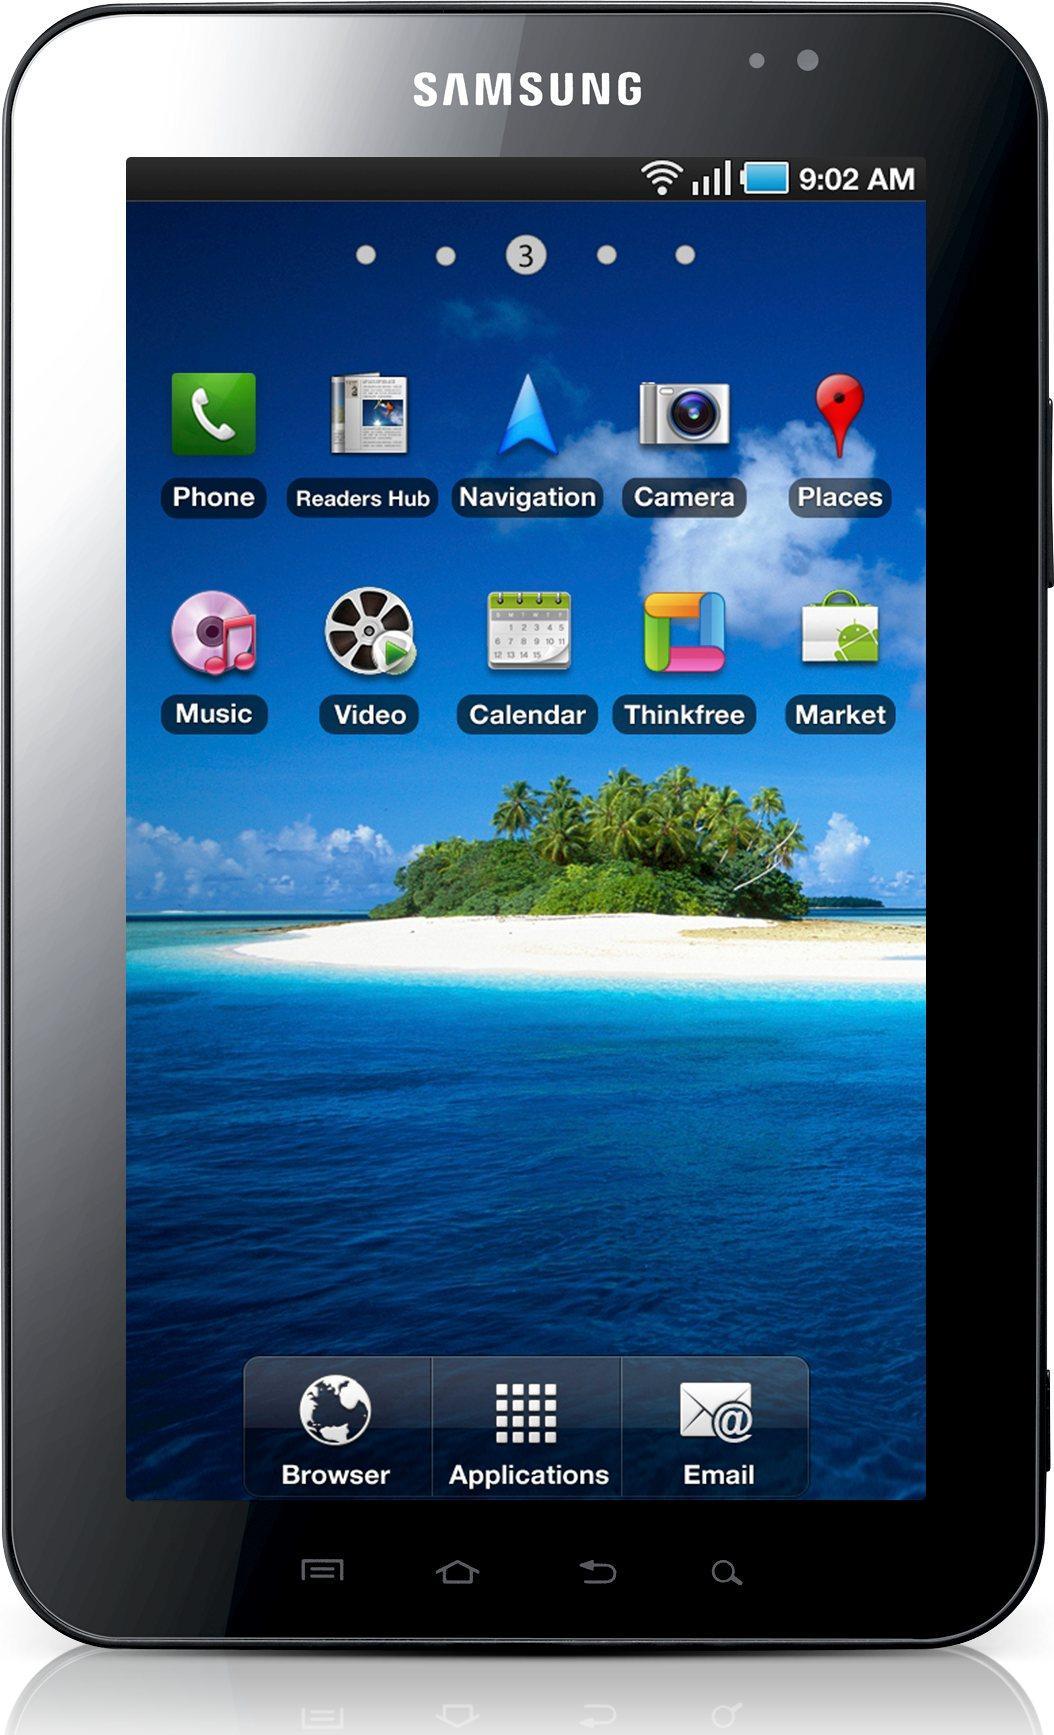 Galaxy Tab (3G + WiFi) GT-P1000